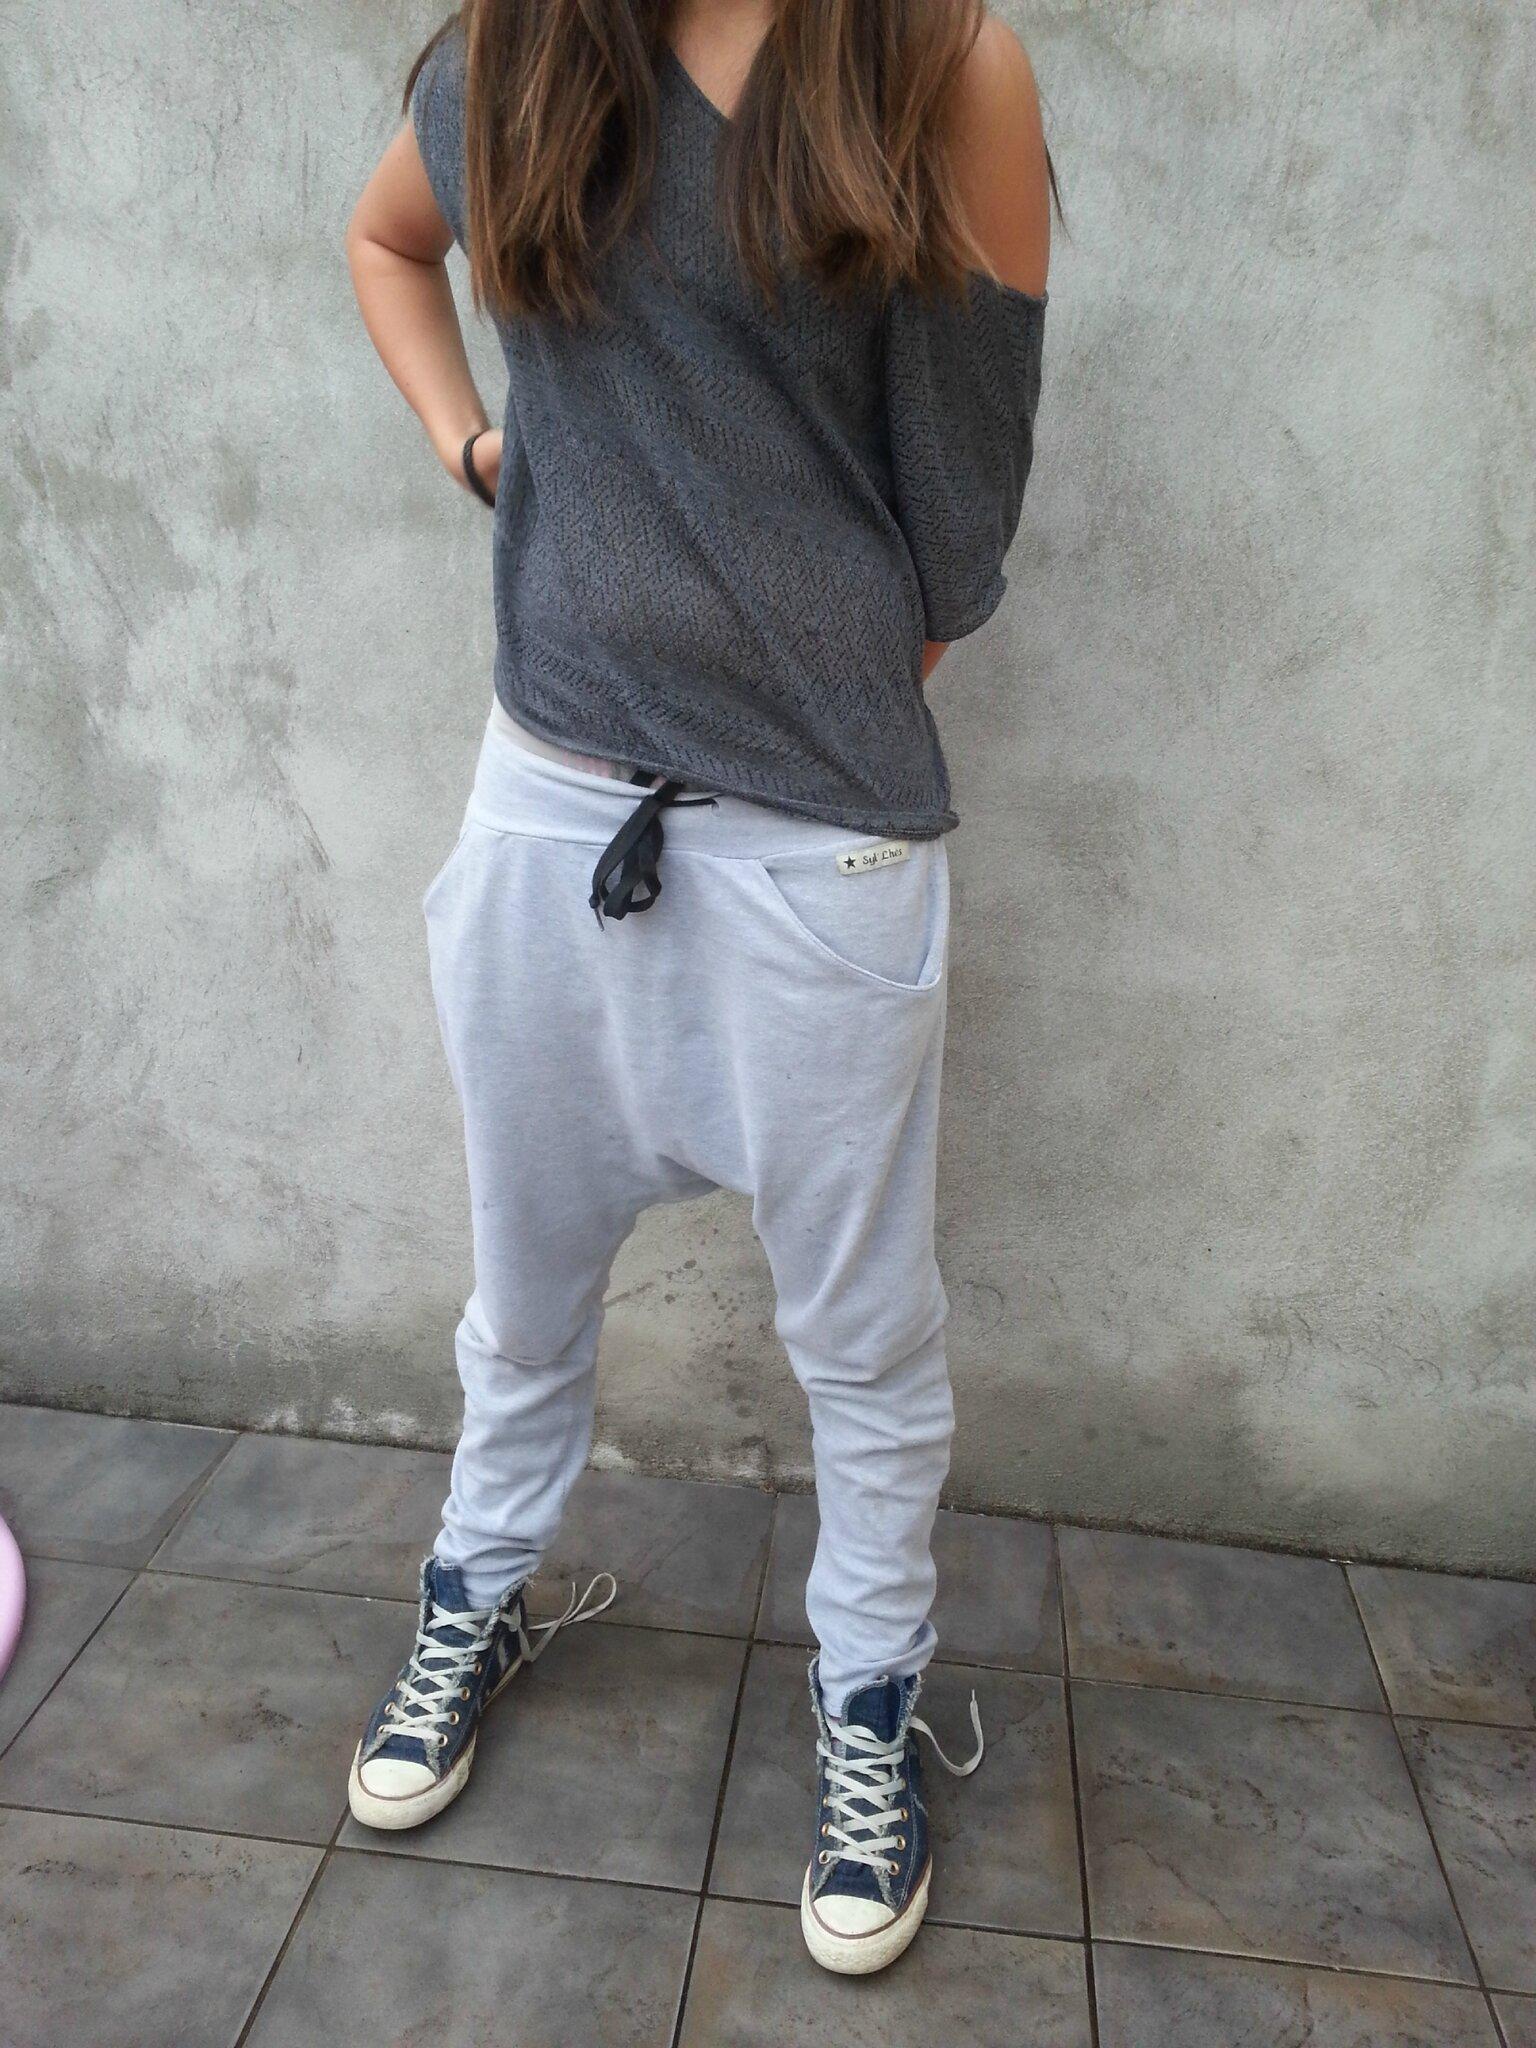 sarouel ado°° style jogging°°